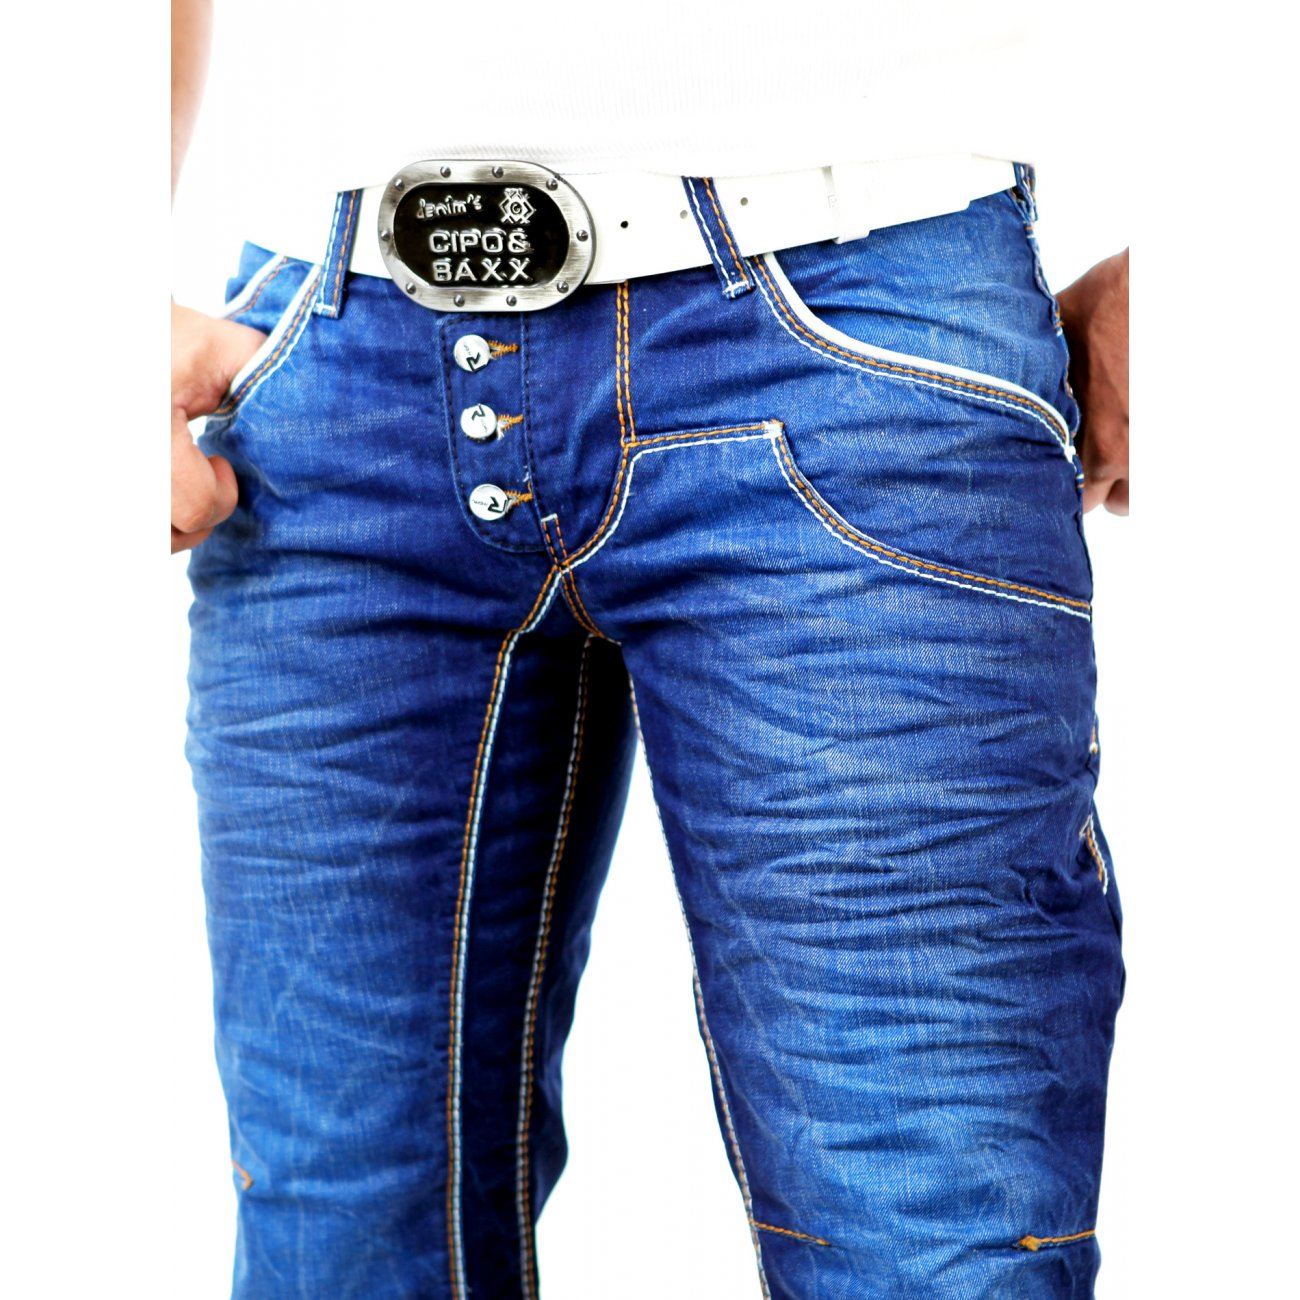 jeans hosen jeanshosen r neal herren used look dicke naht. Black Bedroom Furniture Sets. Home Design Ideas